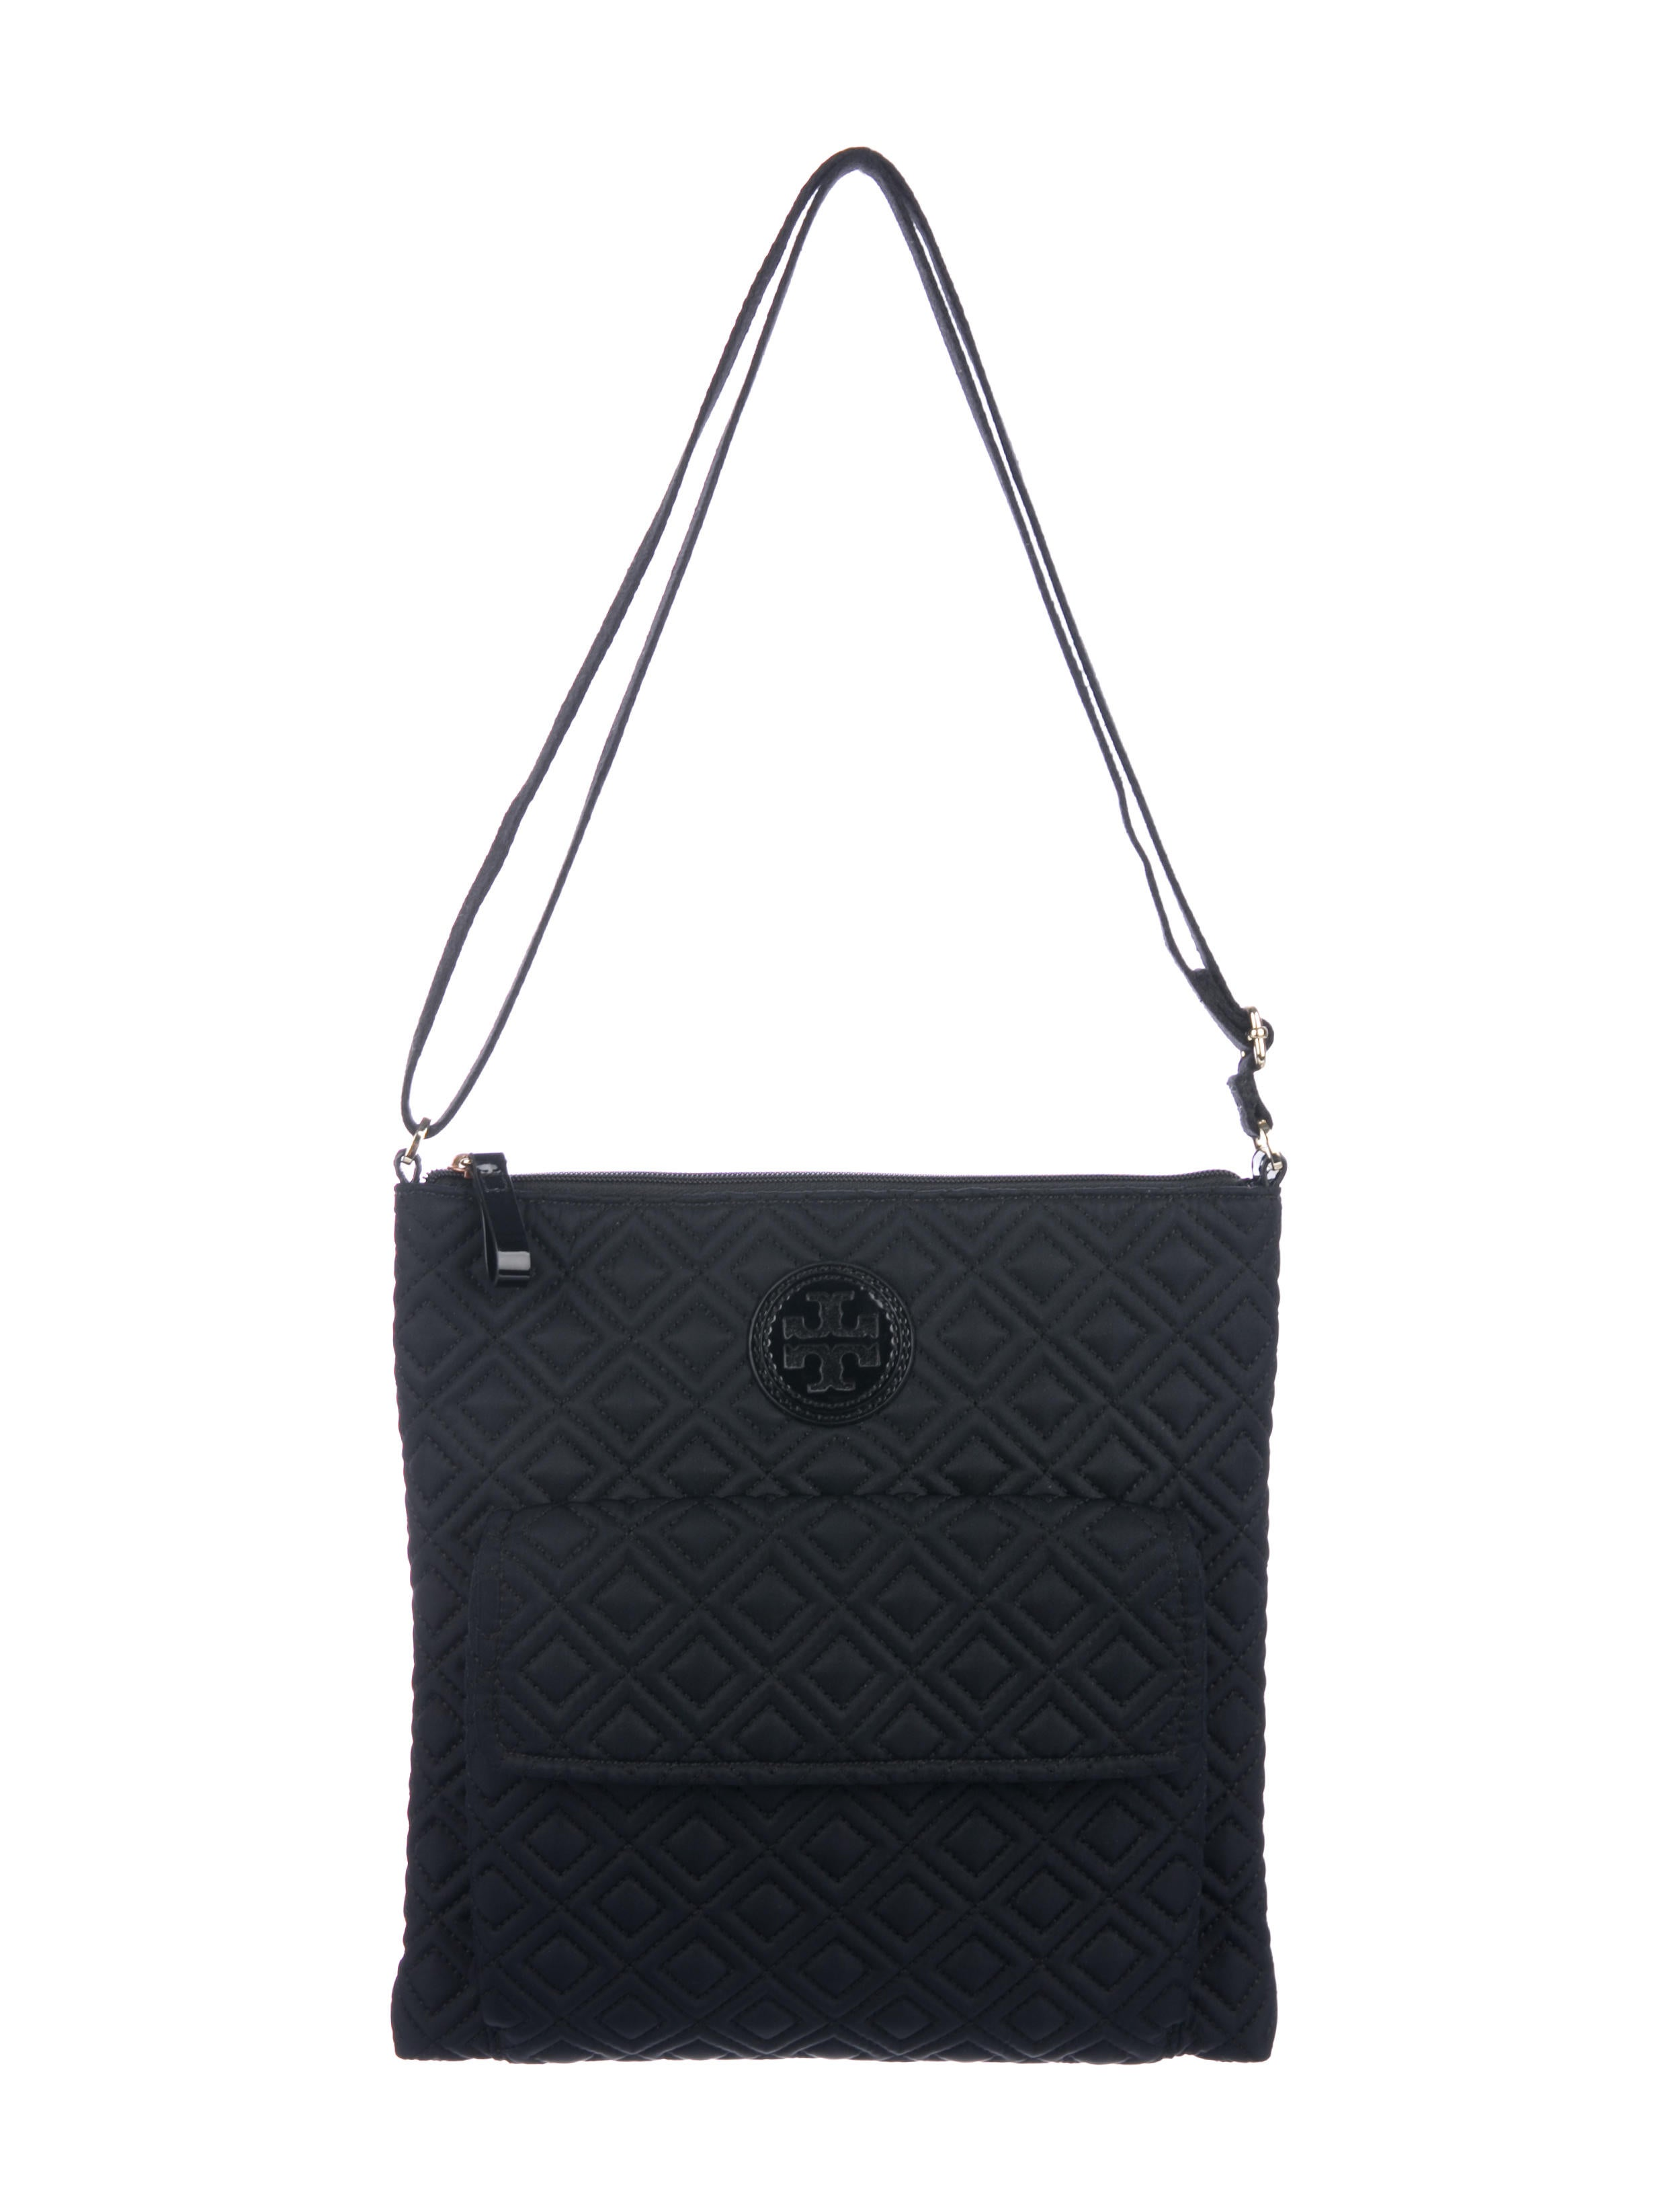 b385ff189c821 Tory Burch Quilted Ariana Swingpack - Handbags - WTO135646